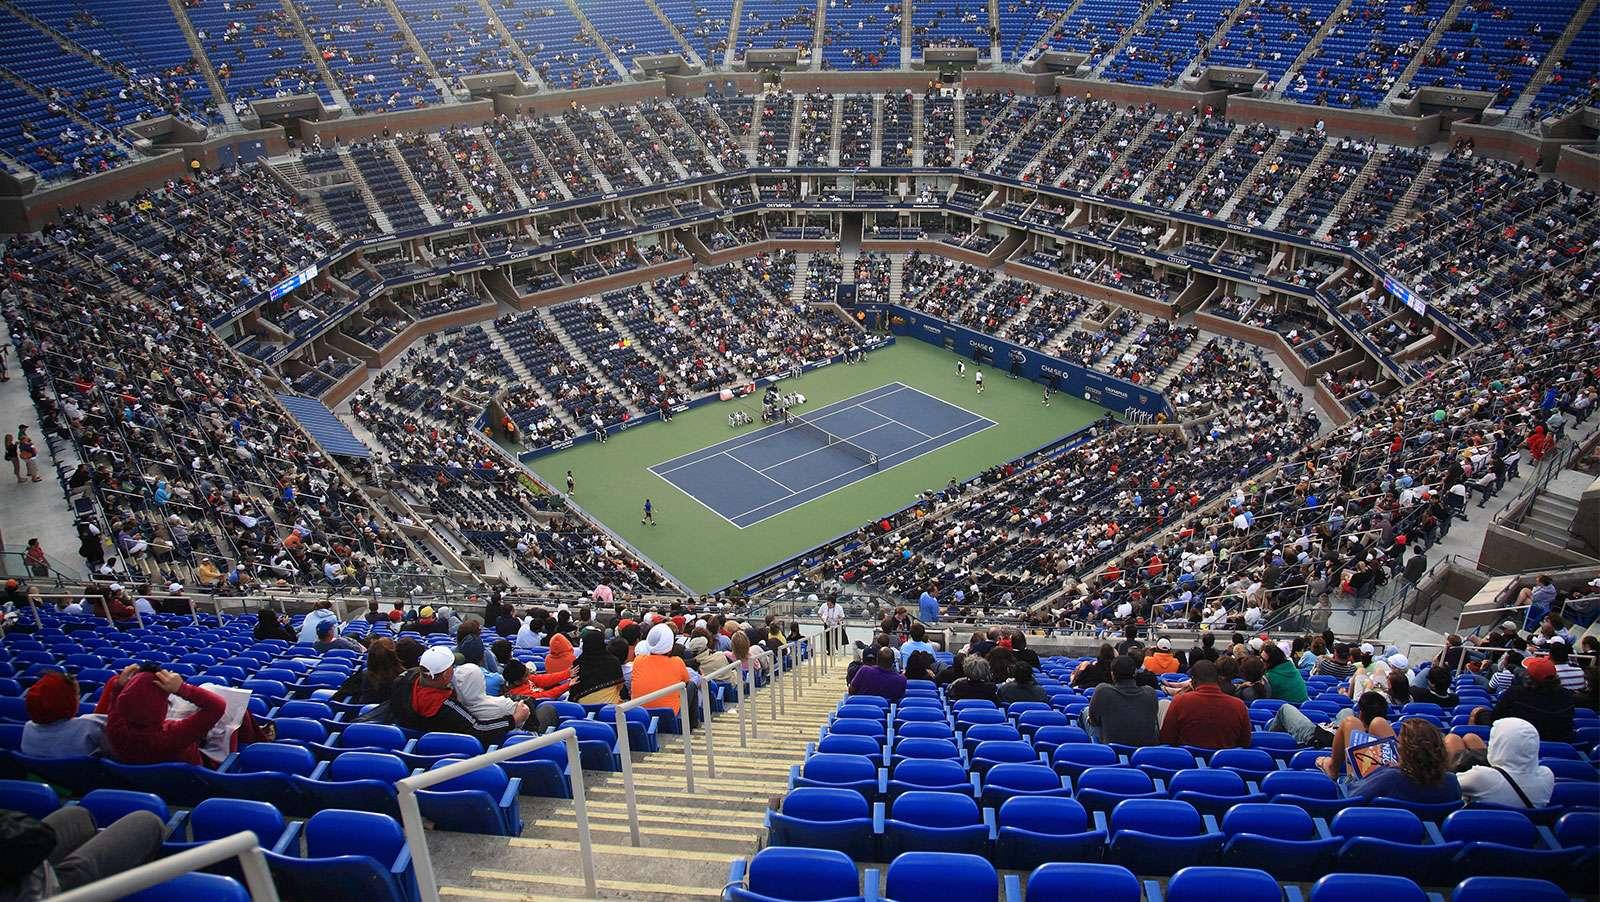 Djokovic, Williams the Favorites on U.S. Open Odds